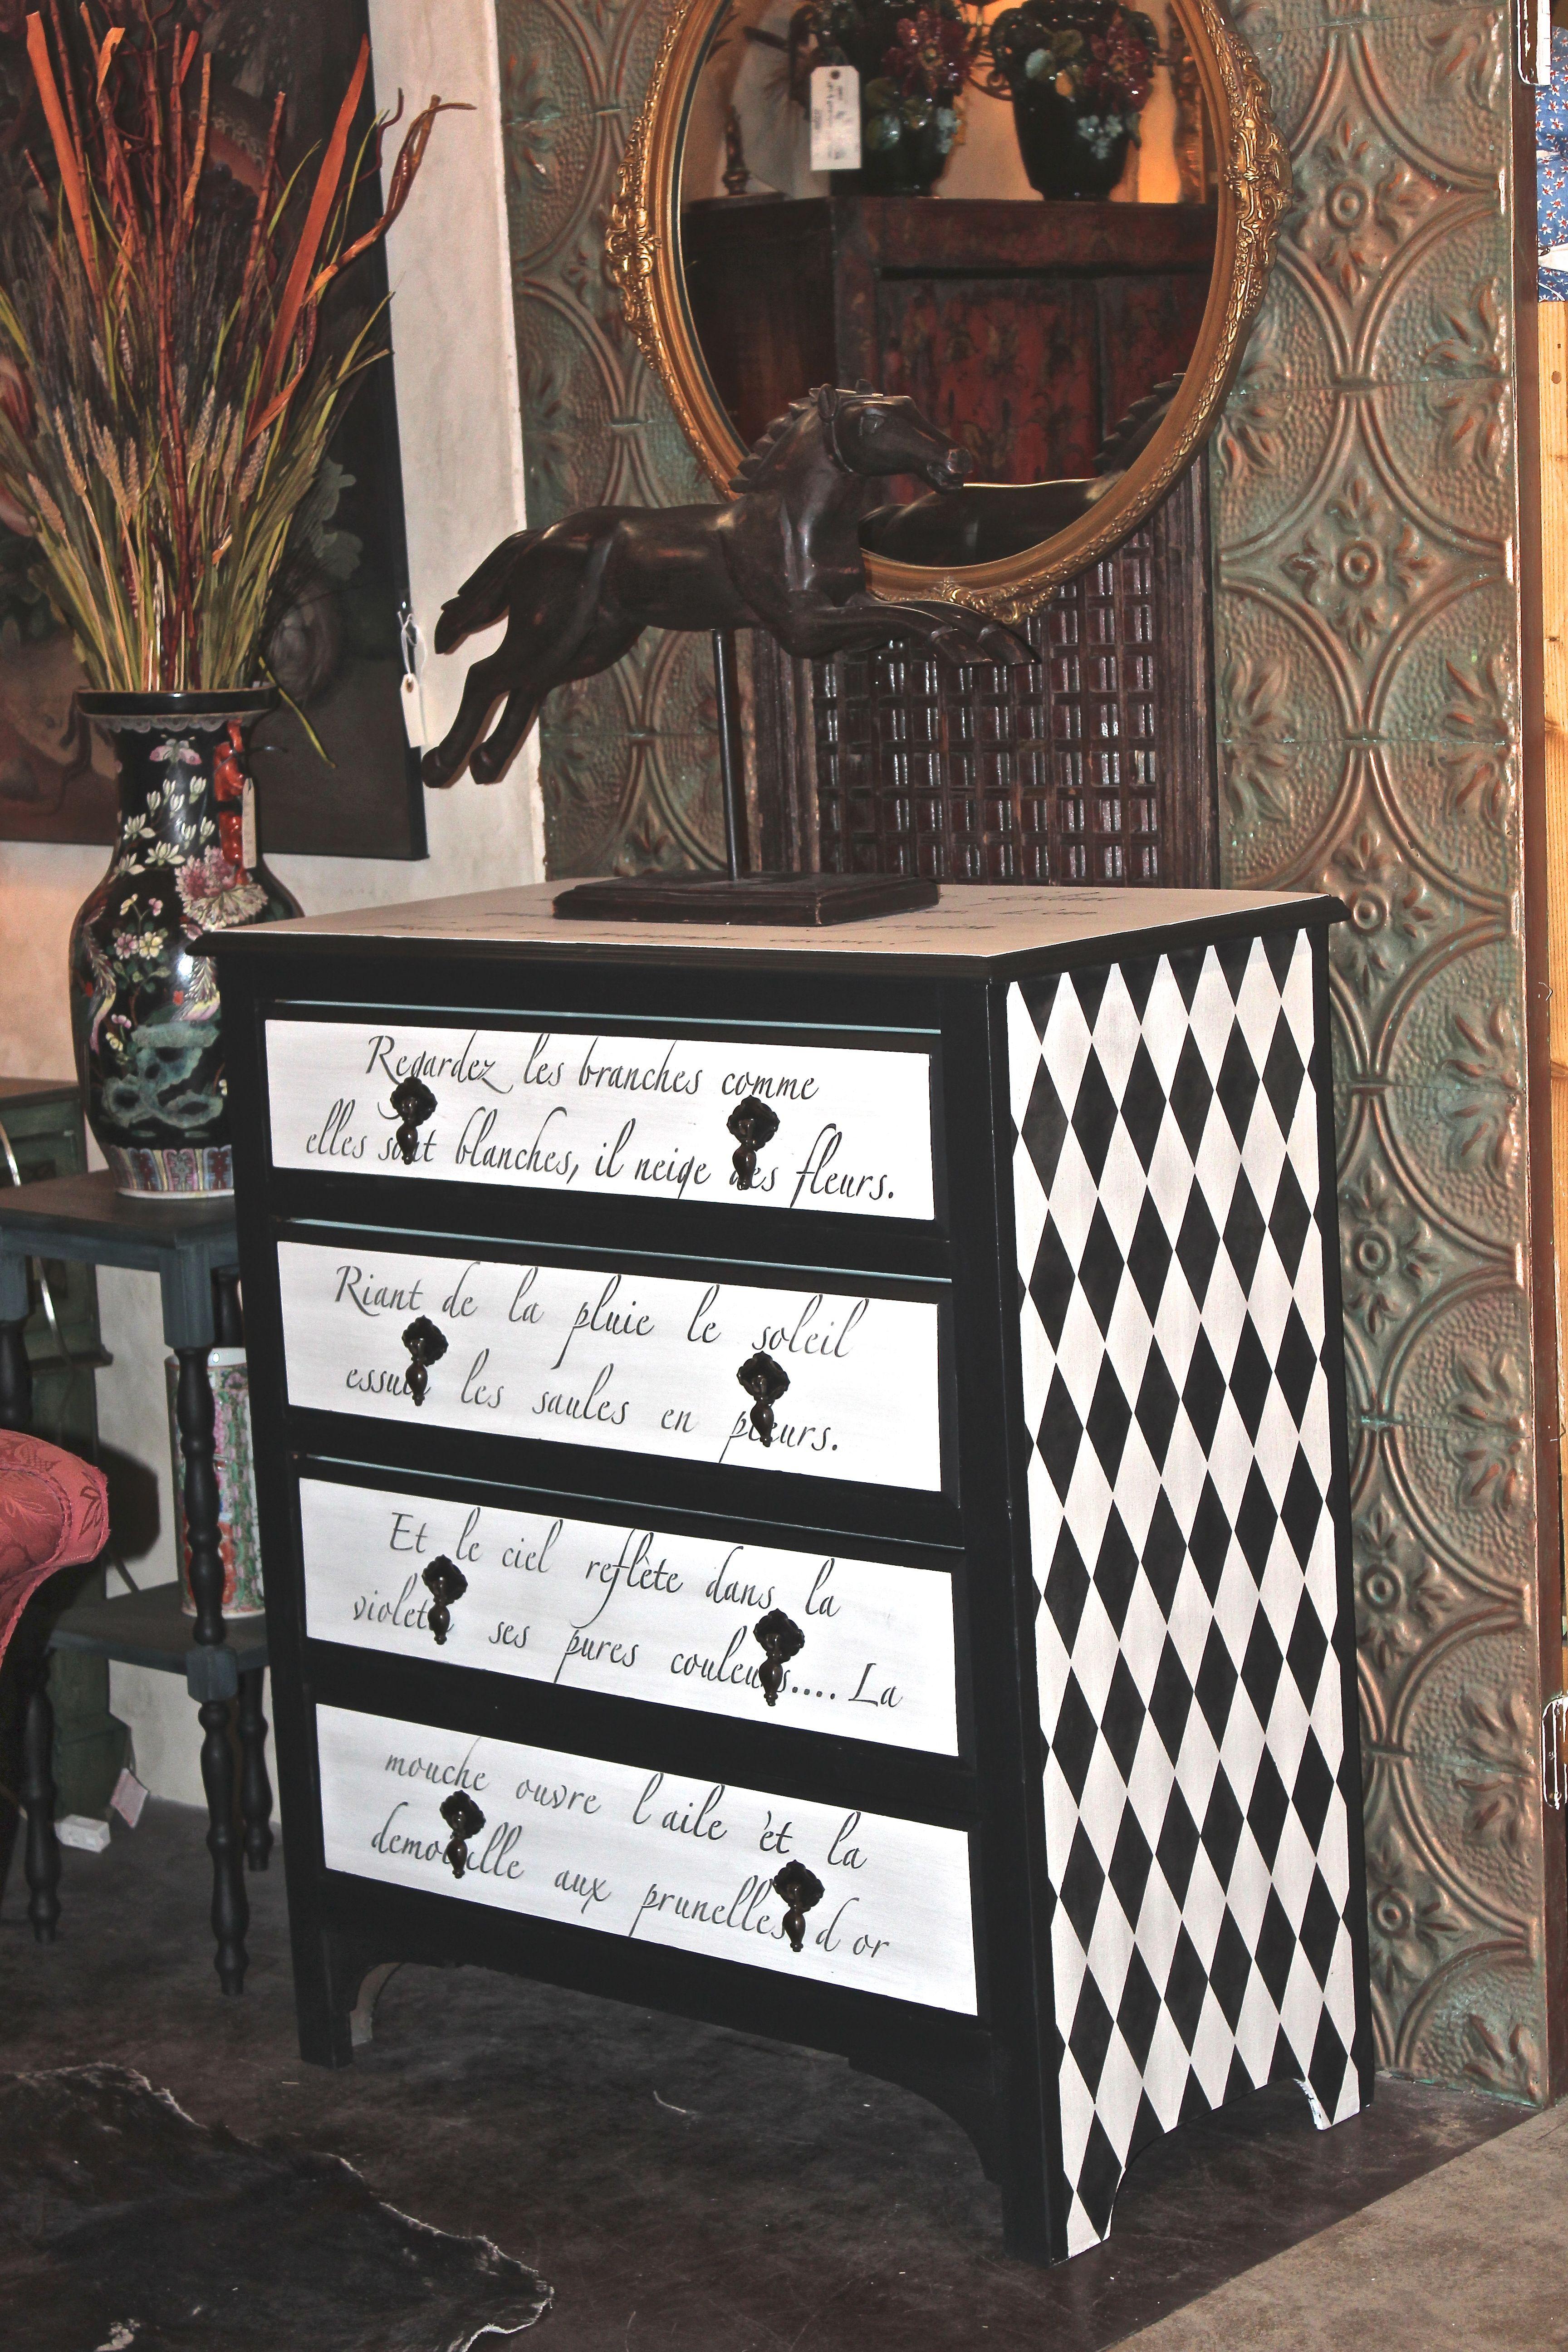 Farmhouse Paints in antique black and cotton white w